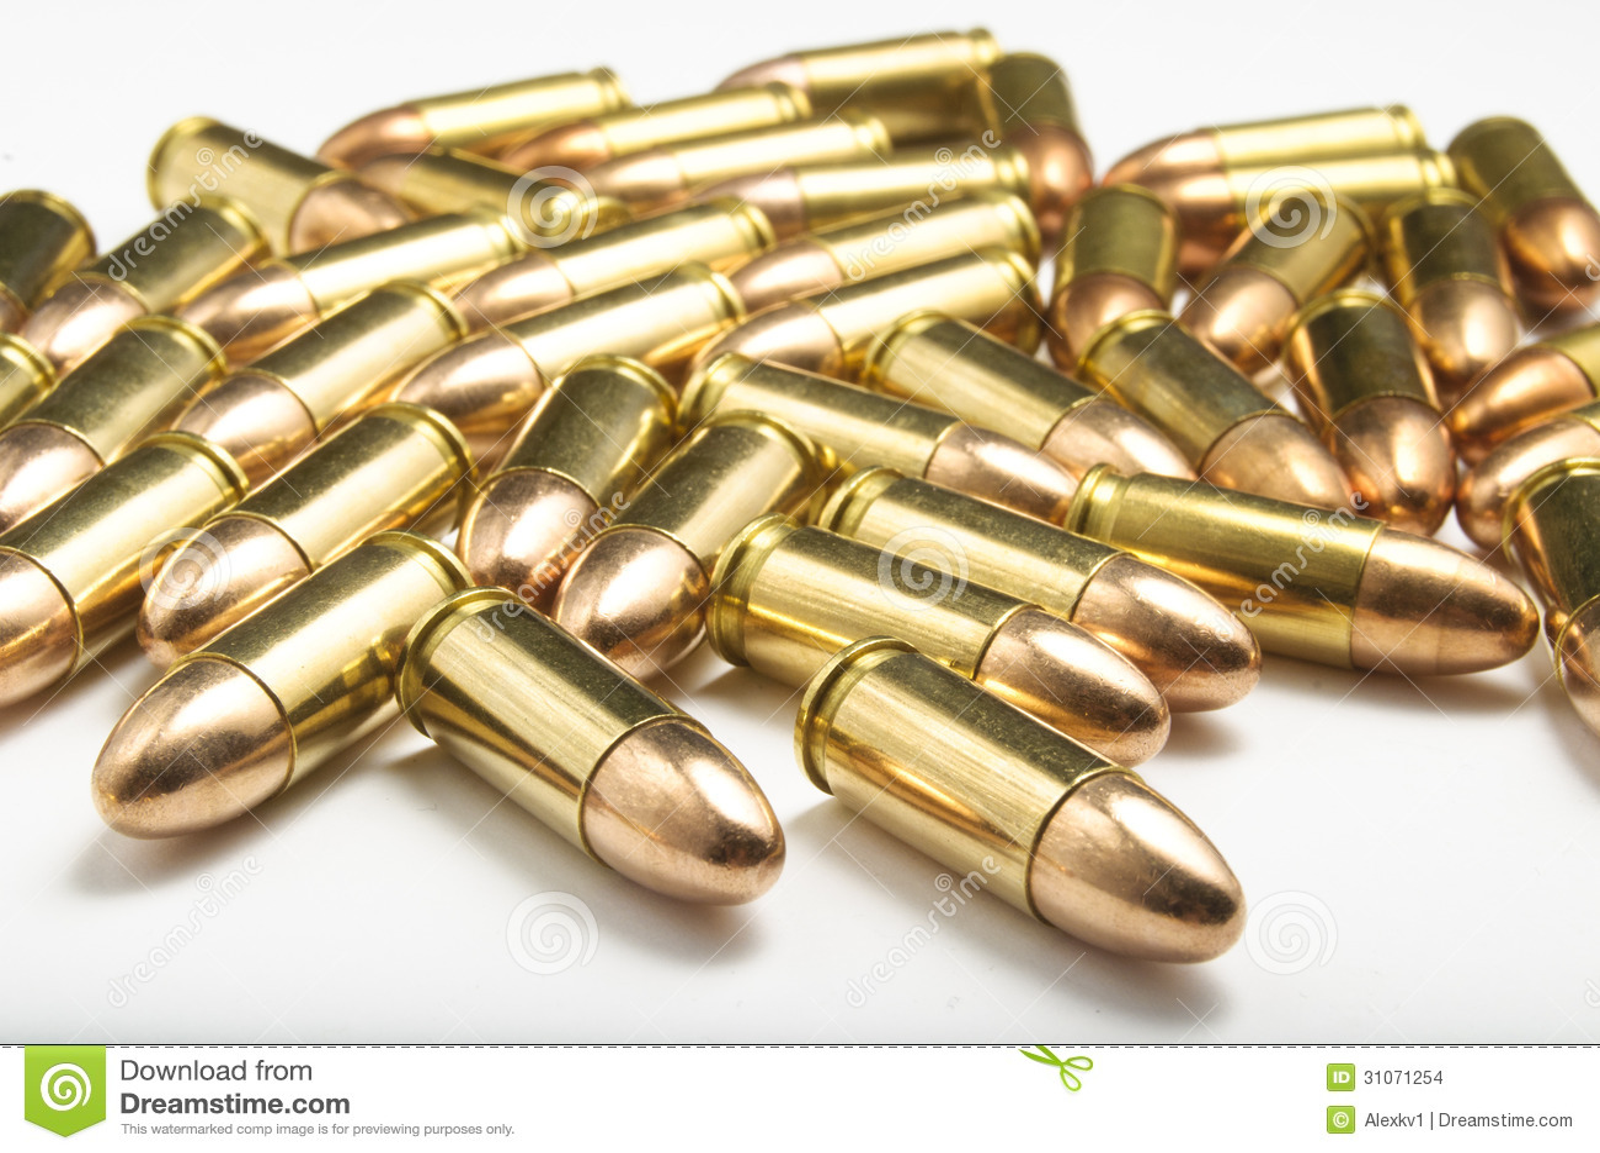 fotos gun bullet - photo #5